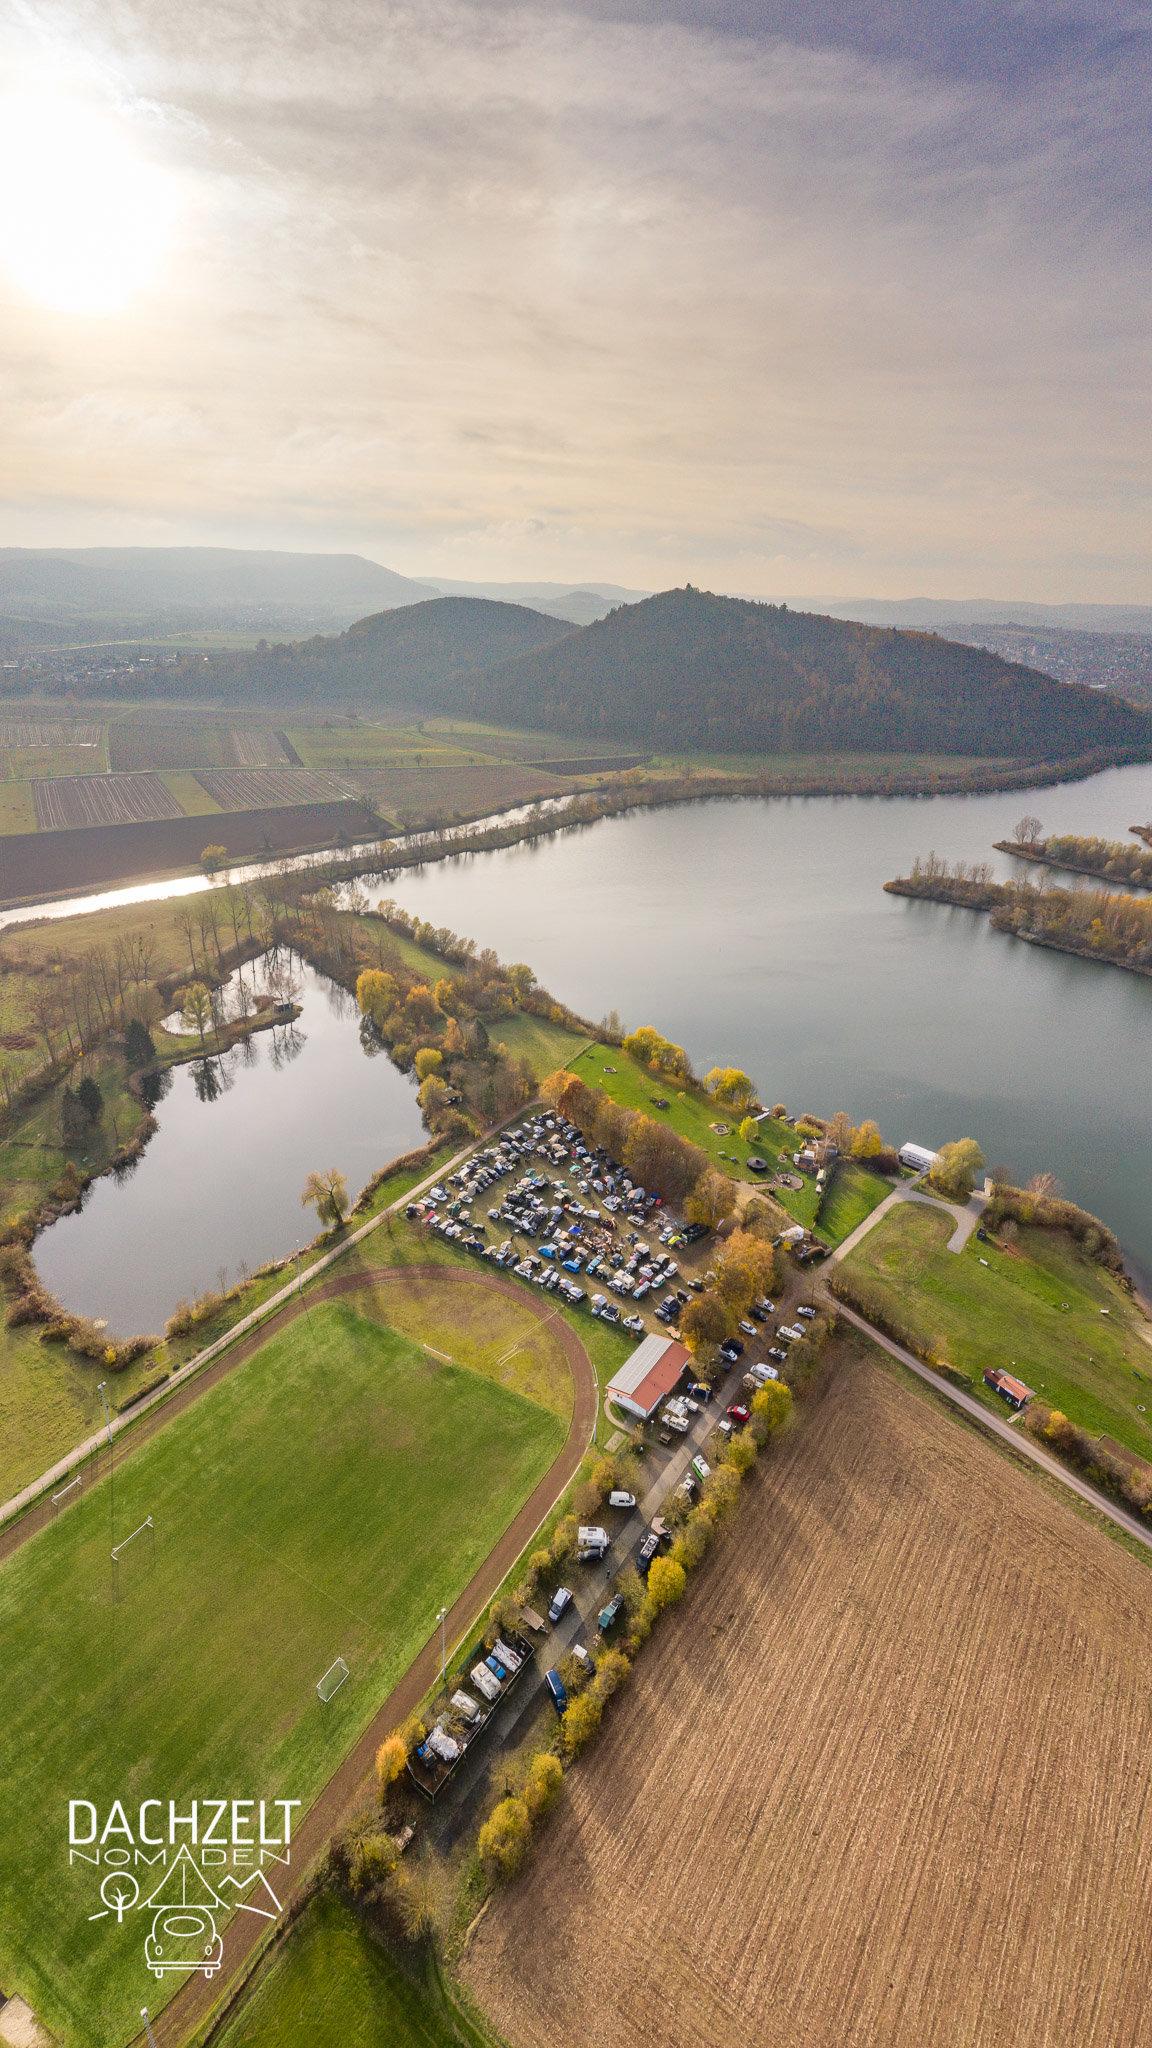 20191123-DACHZELT-MEETUP-NORDHESSEN-Thilo-Vogel-DJI 0853-Pano